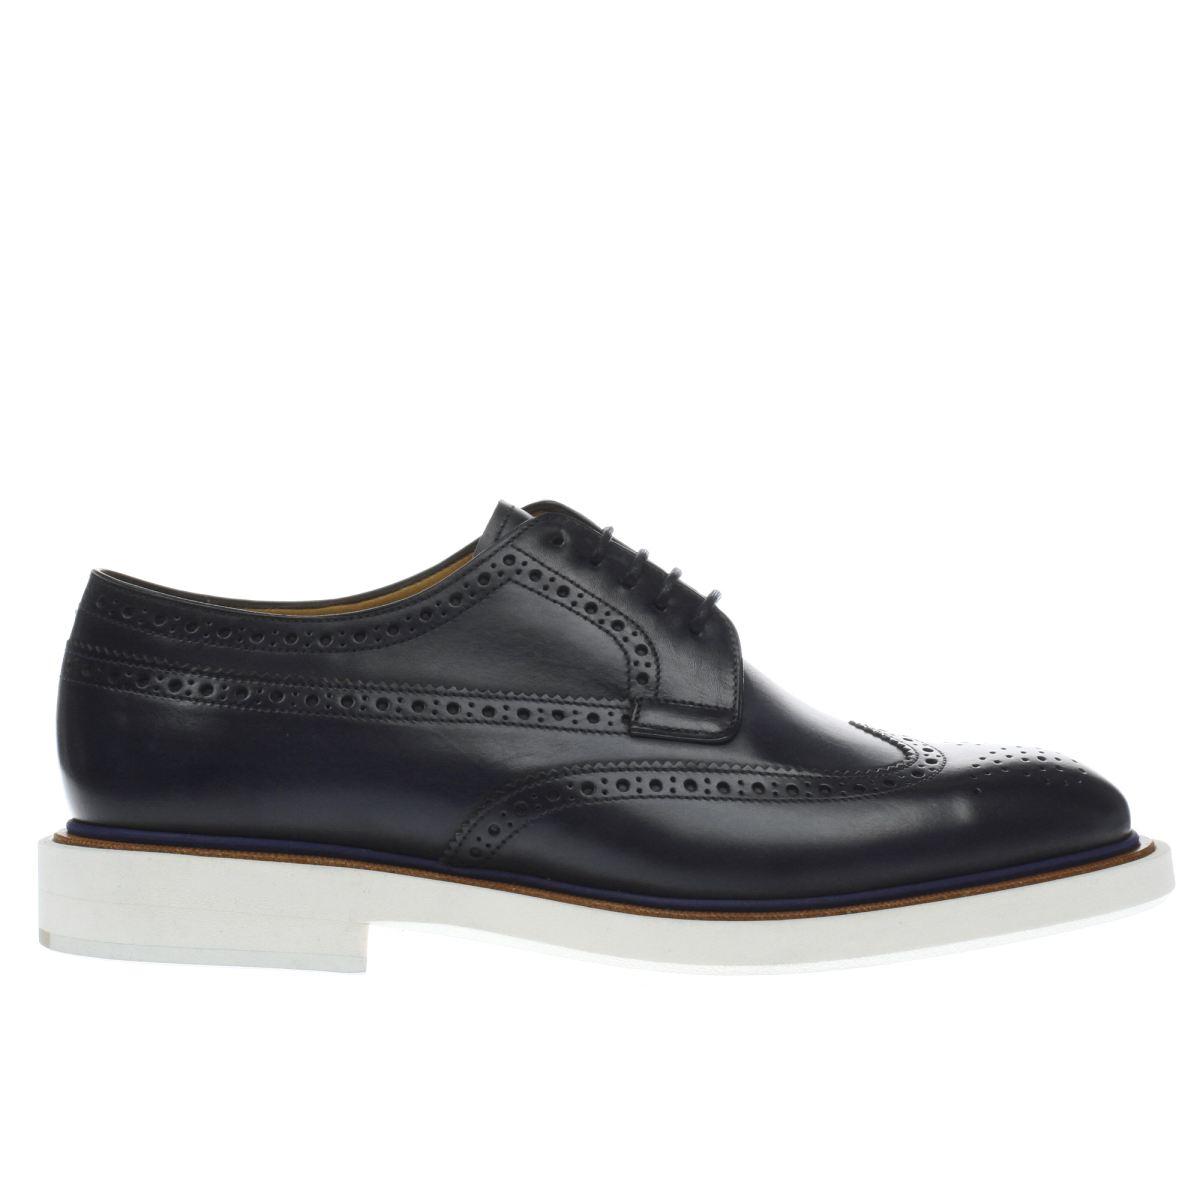 paul smith shoe ps Paul Smith Shoe Ps Navy Junior Shoes